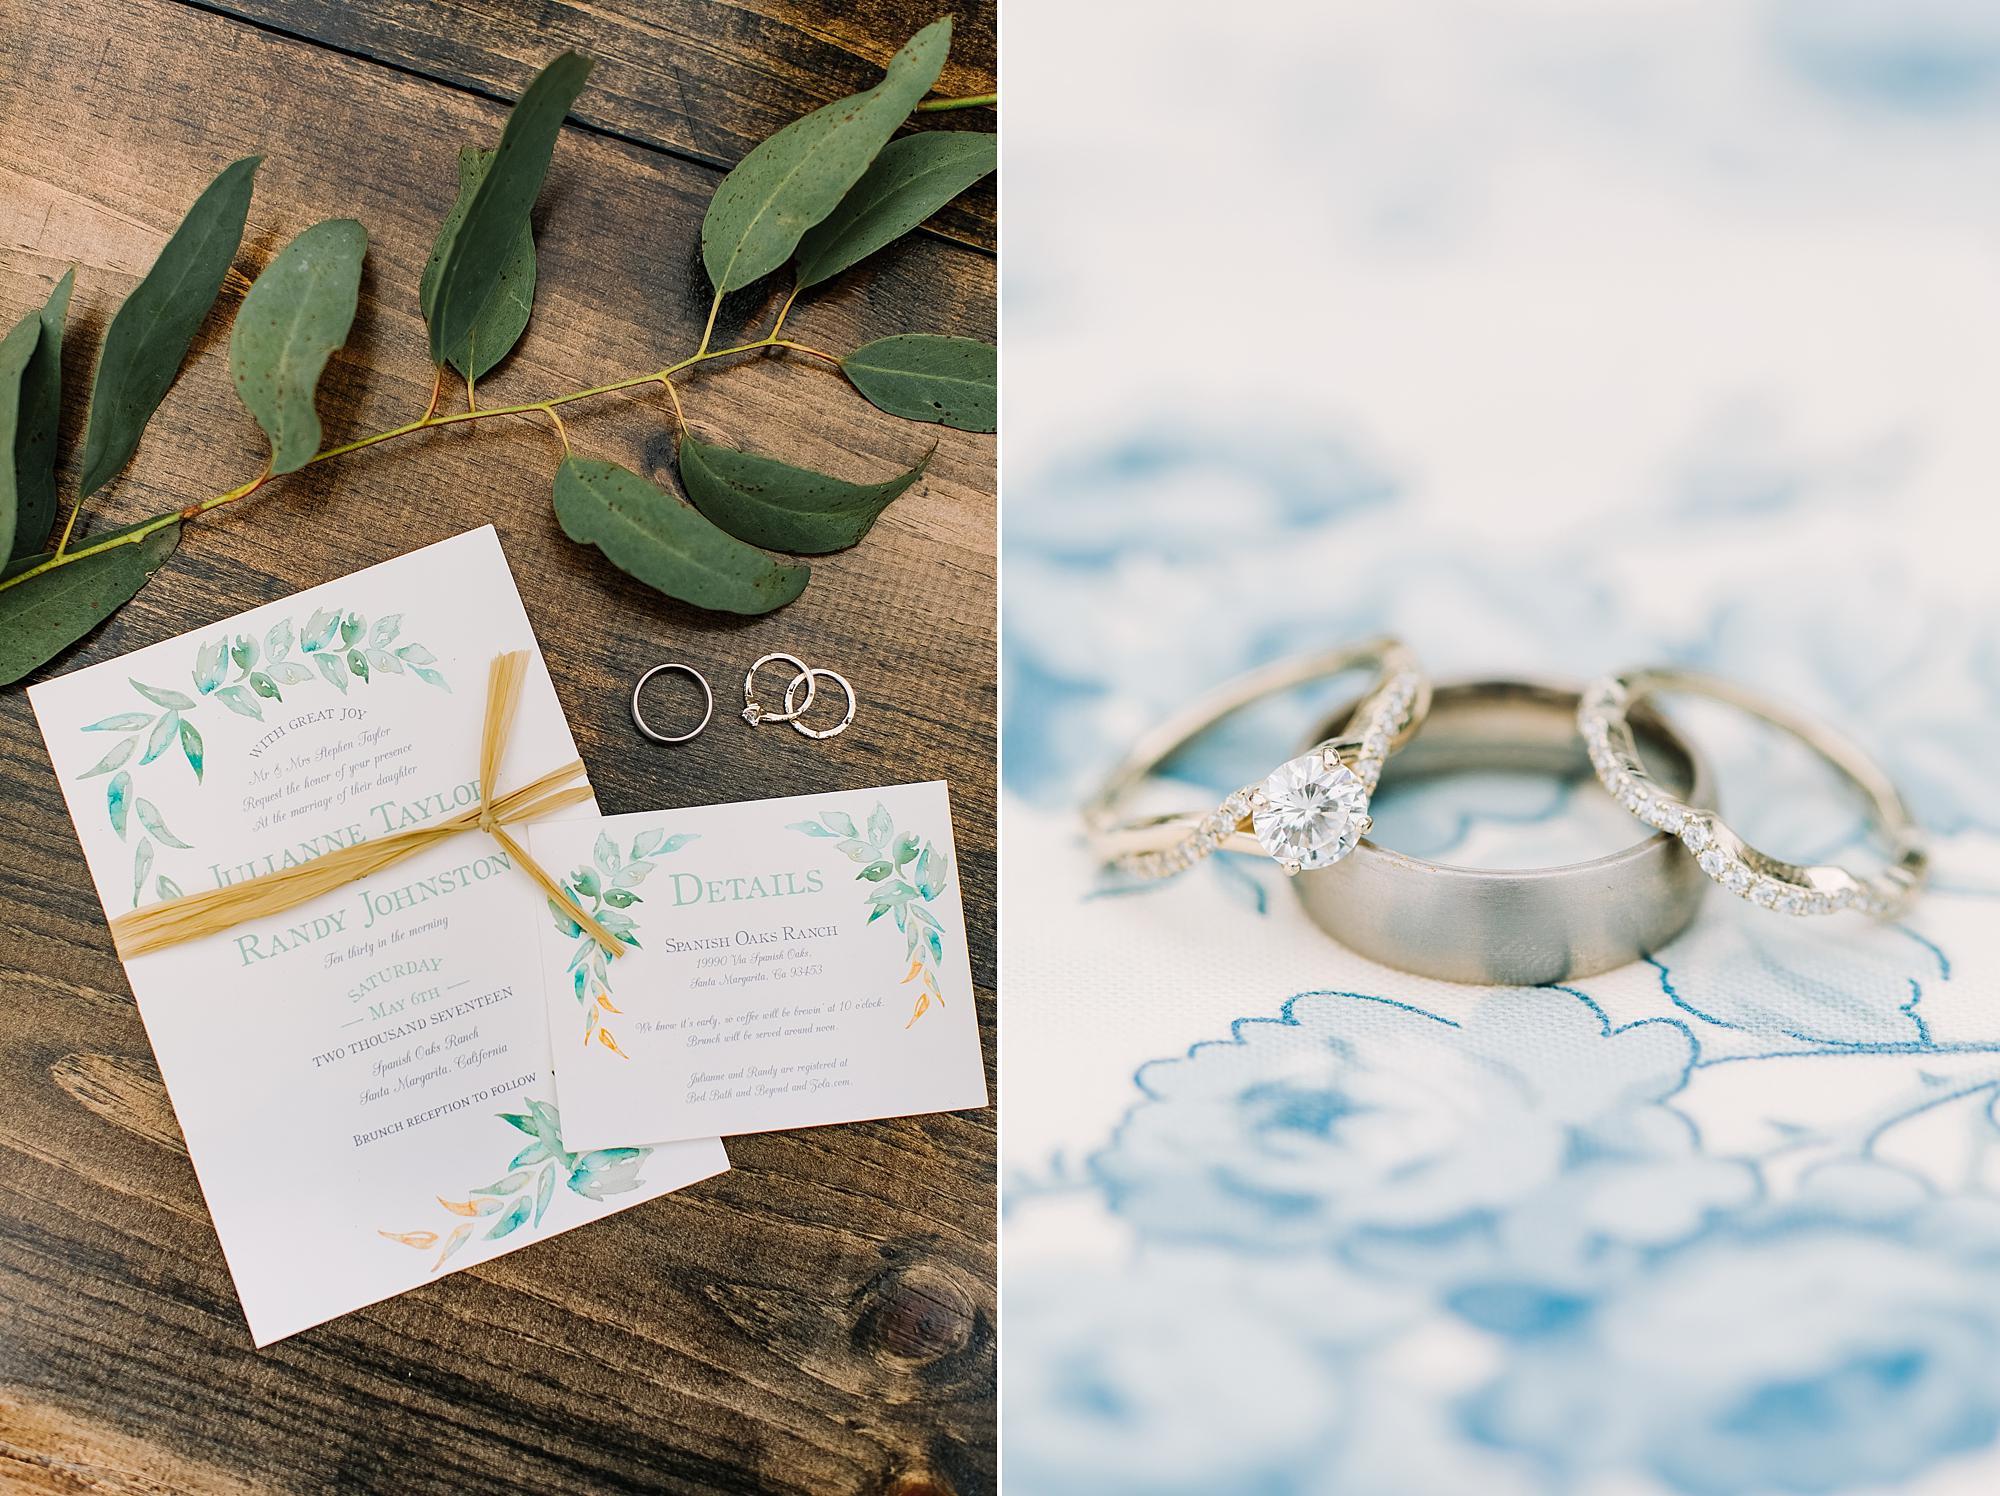 Spanish Oaks Ranch Wedding, Santa Margarita, San Luis Obispo wedding photographer